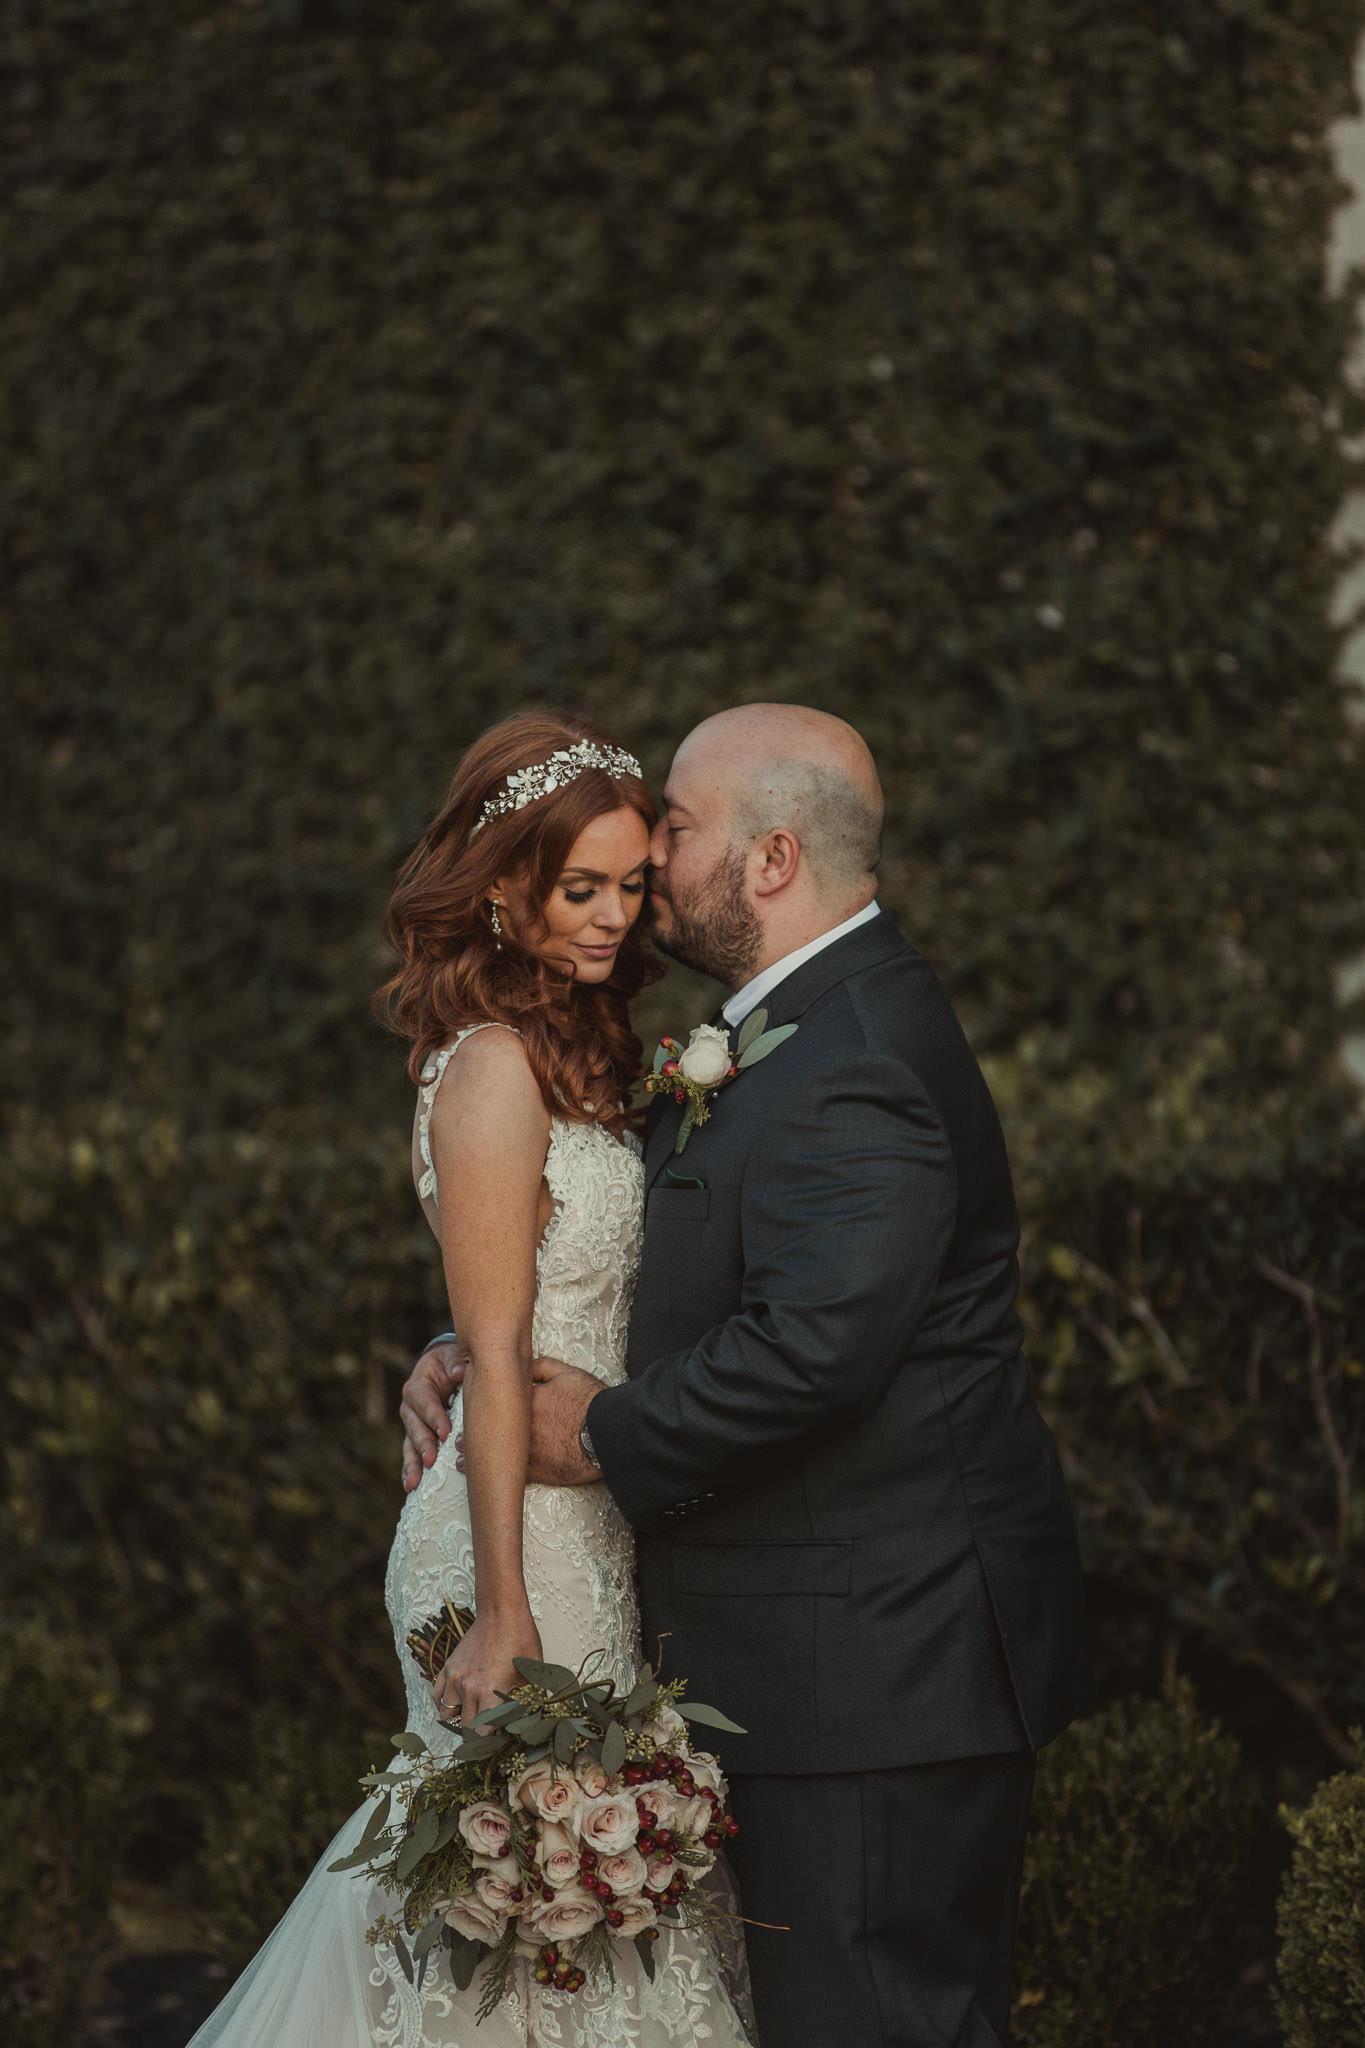 Cynthia-Curtis-Olde-Dobbine-Station-Houston-Wedding-Photographer-sm-76.jpg